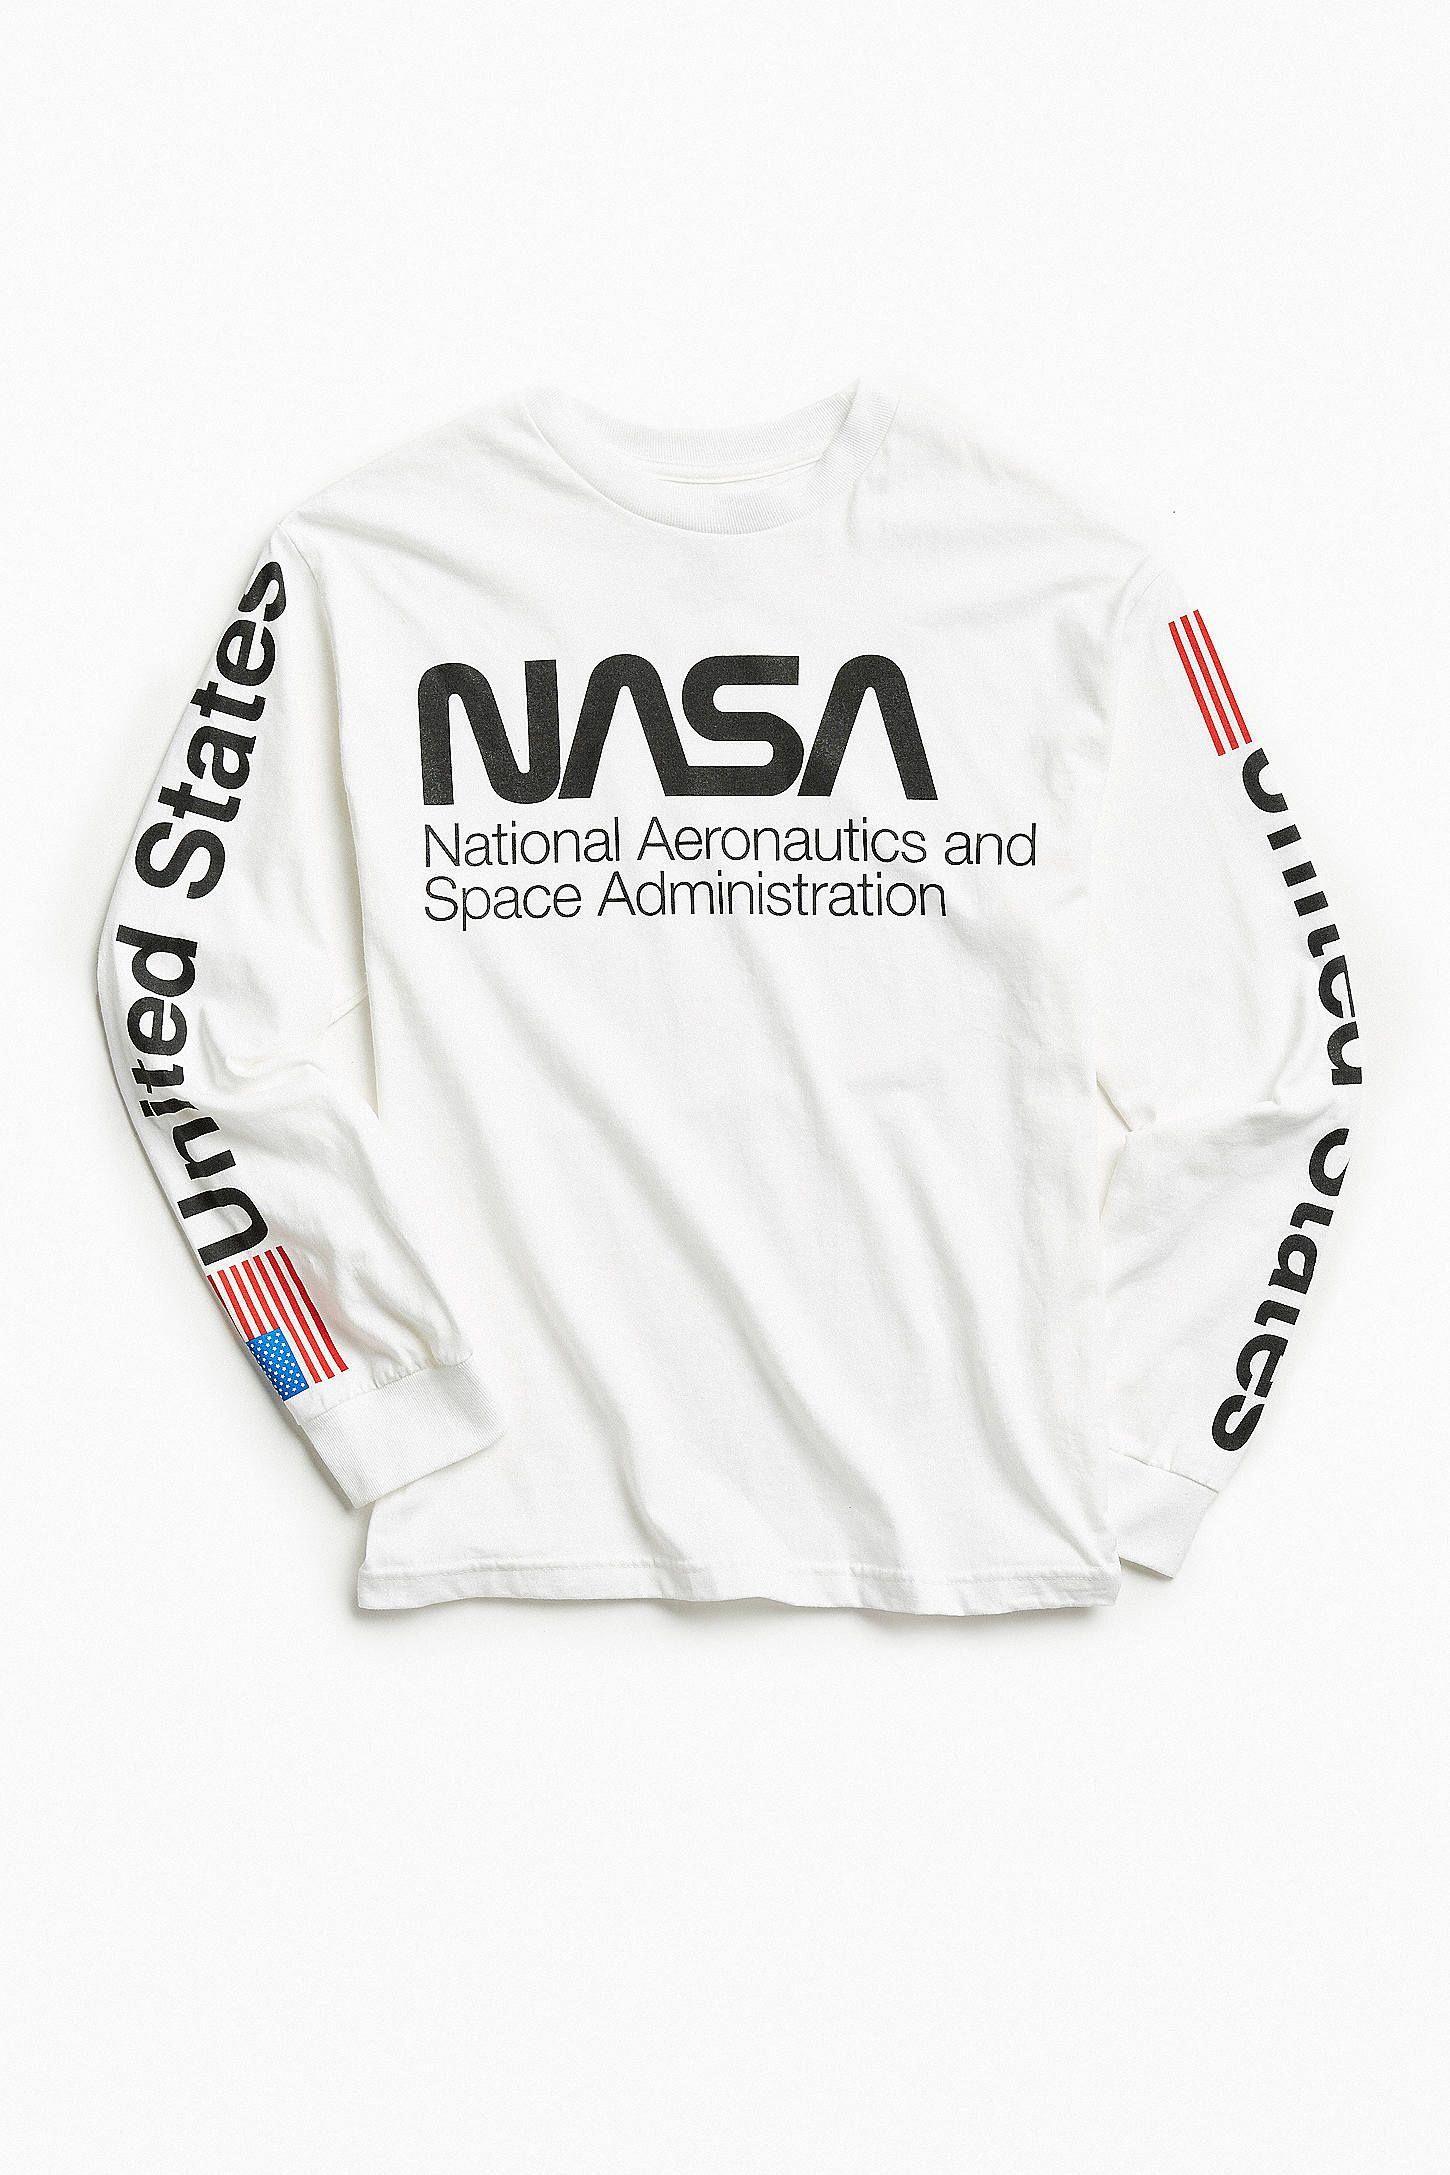 55ce3026609725 Slide View  1  NASA Worm Logo Long Sleeve Tee  mensfashionideas ...